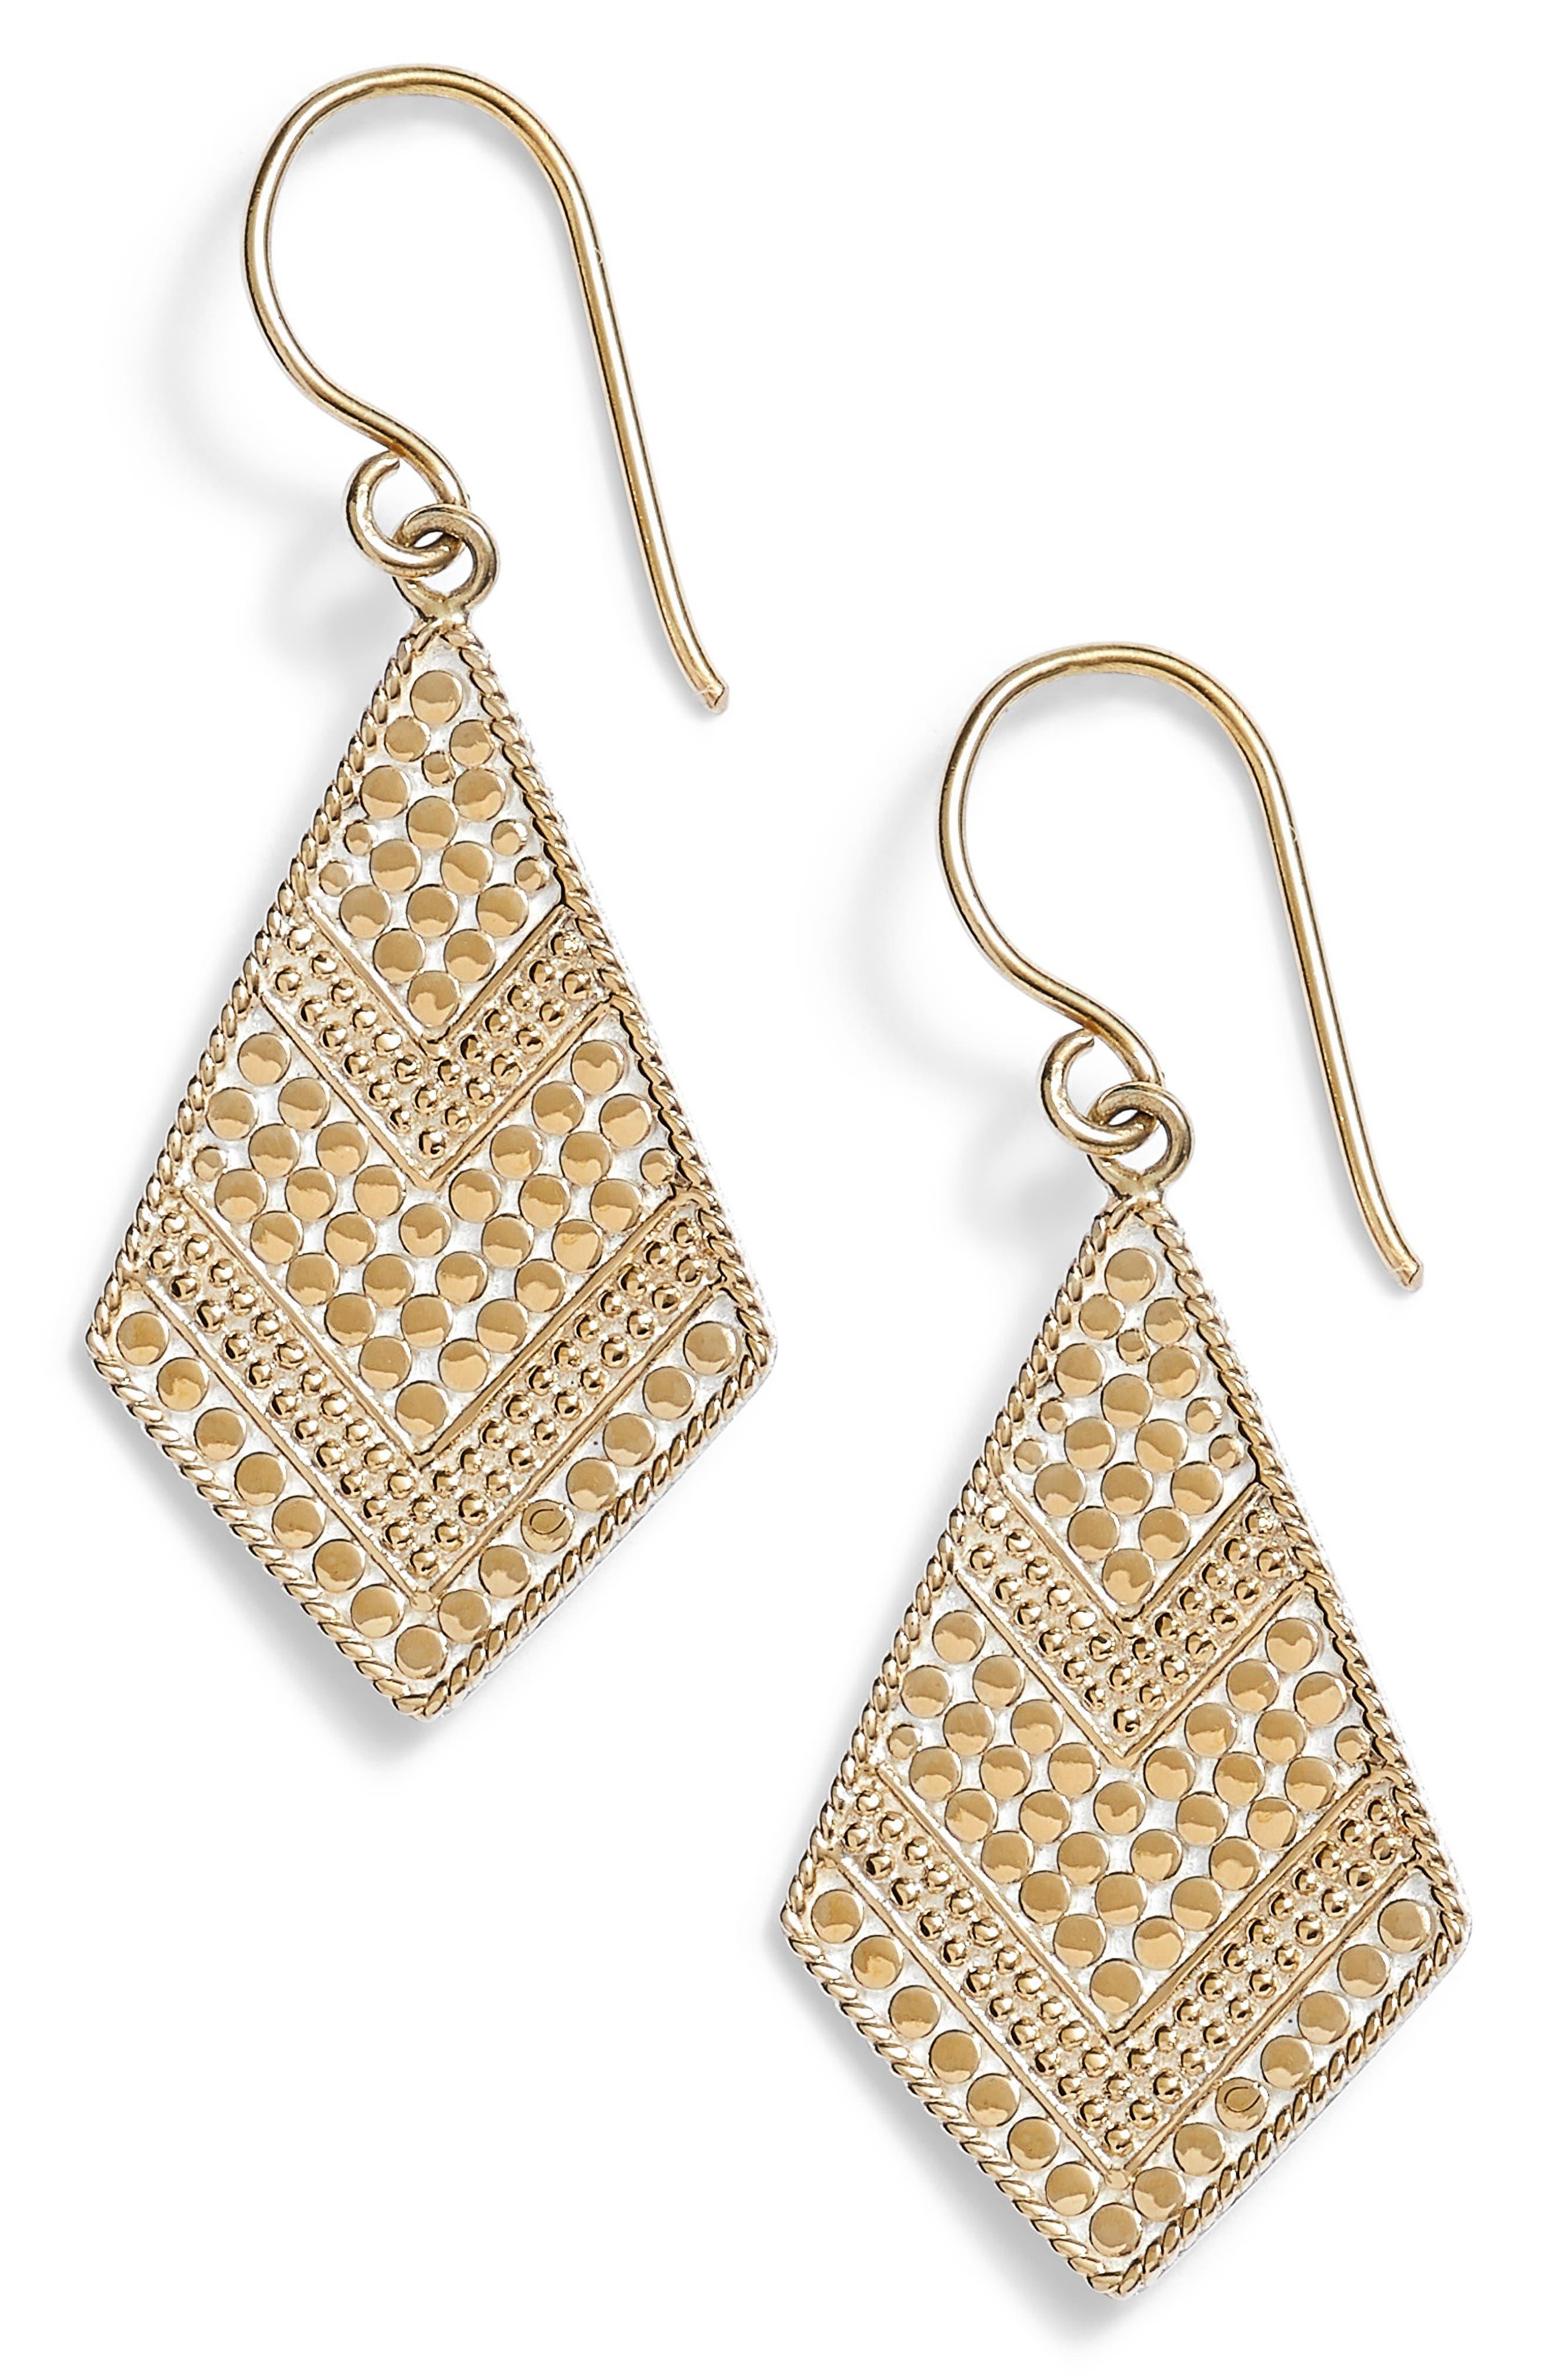 Gold Kite Drop Earrings,                             Main thumbnail 1, color,                             710